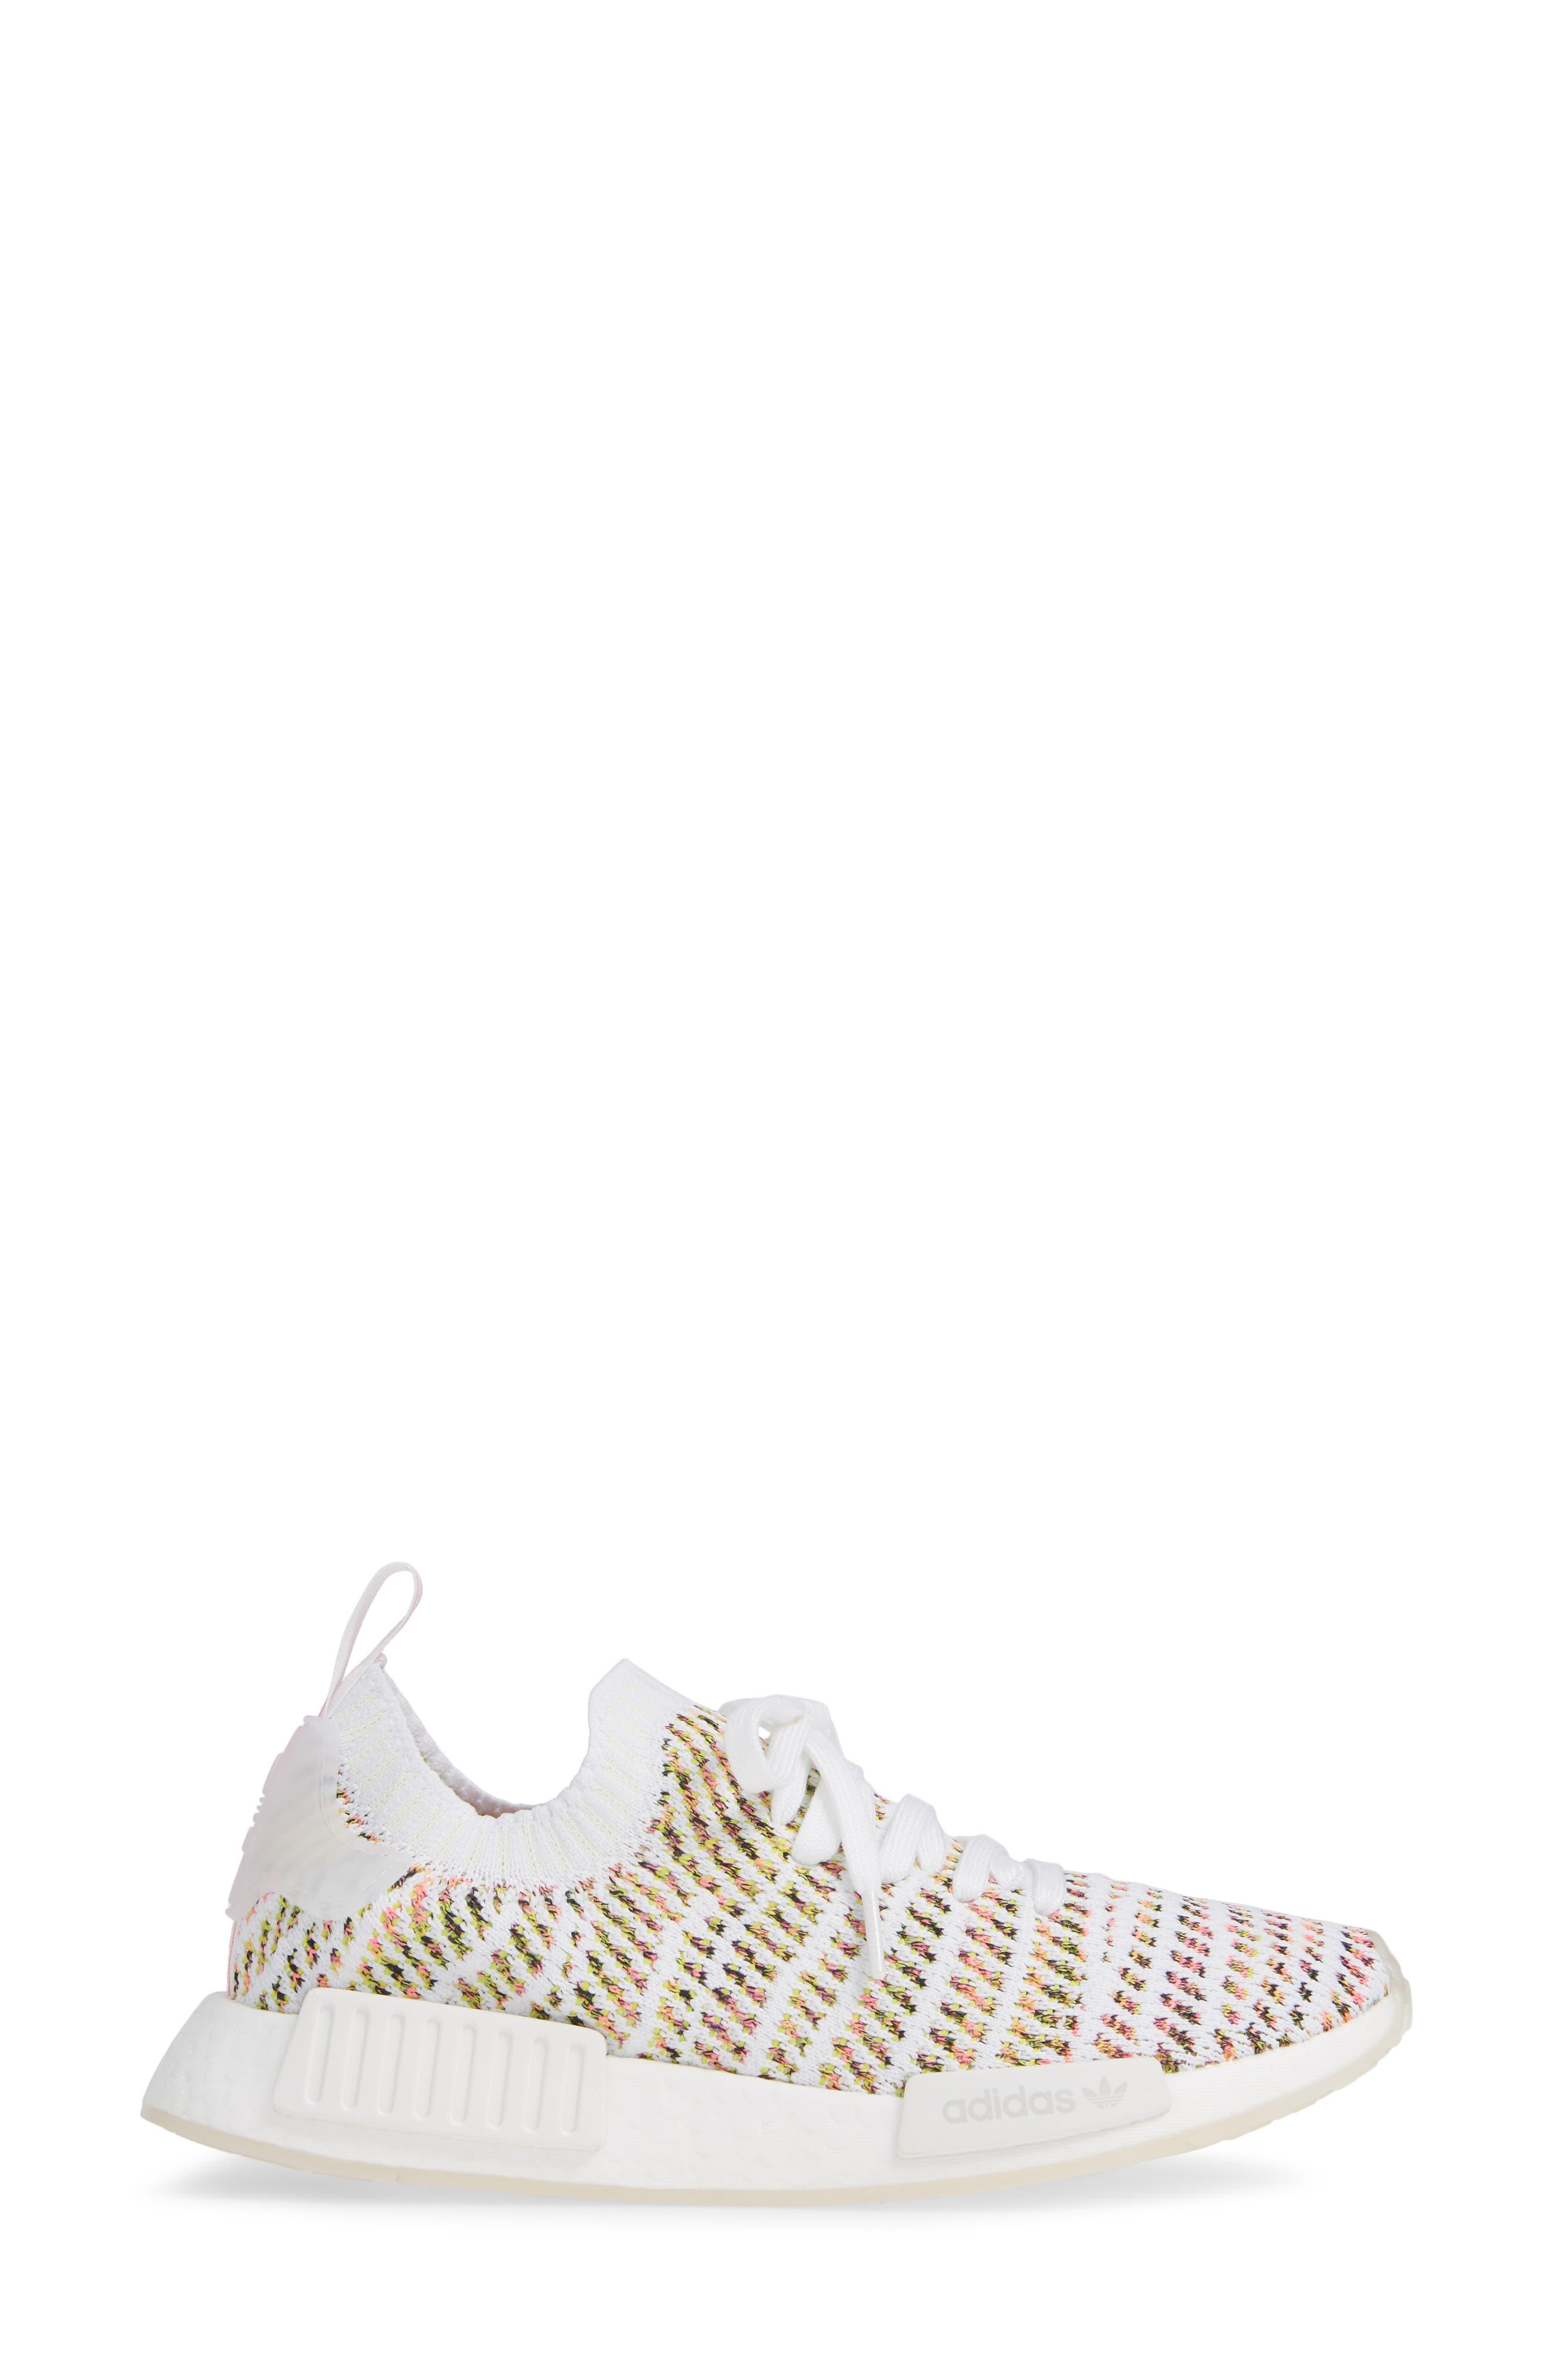 NMD R1 STLT Primeknit Sneaker,                             Alternate thumbnail 3, color,                             WHITE/ YELLOW/ SOLAR PINK